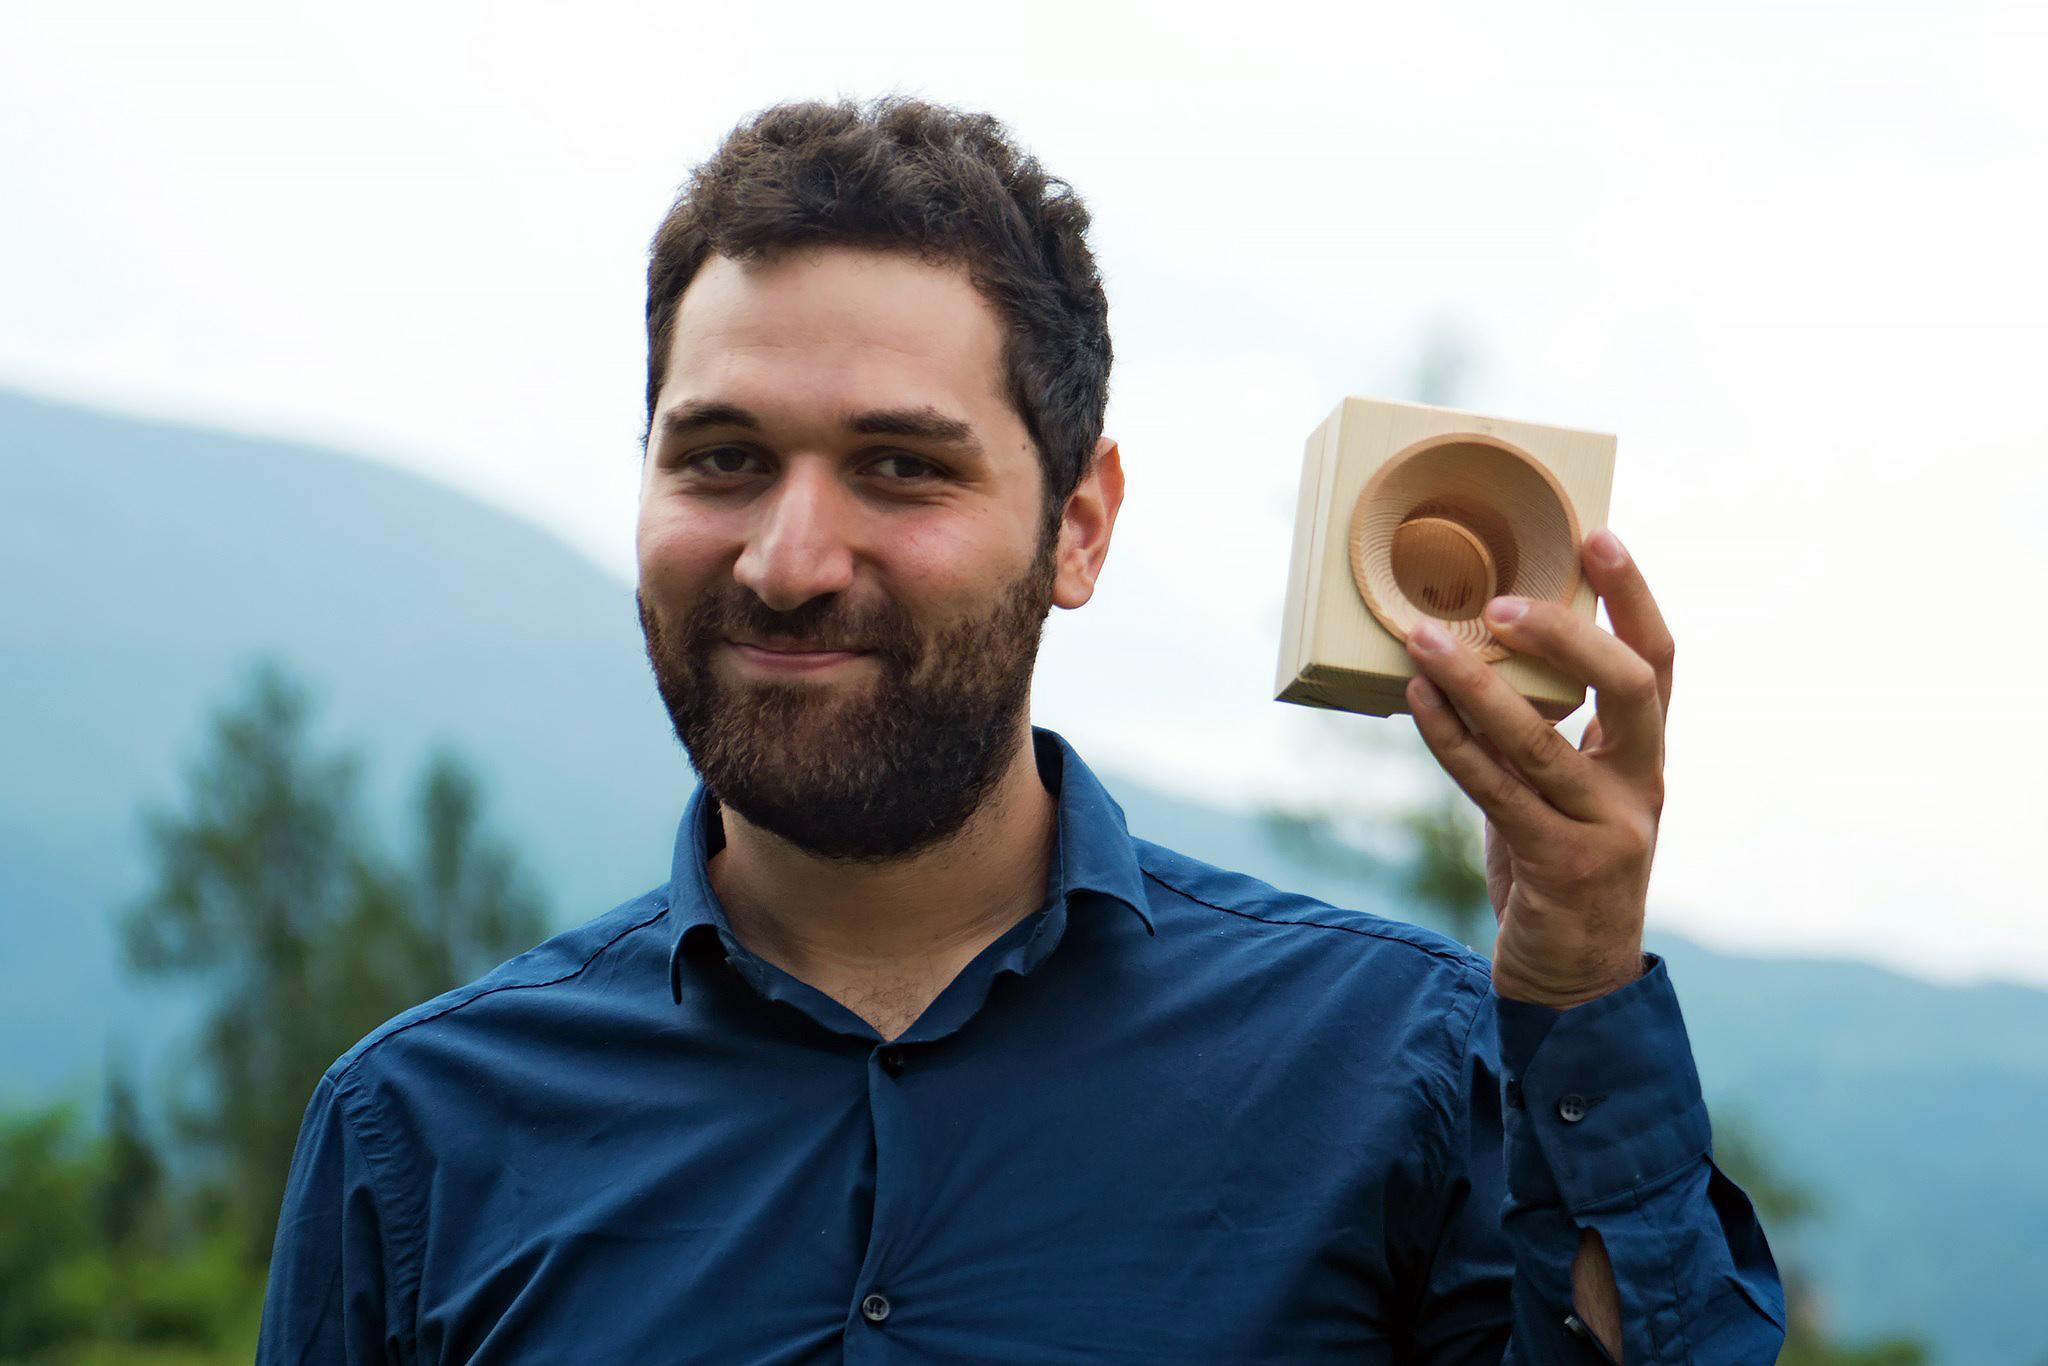 Giuseppe Addamo and the Vaia Cube